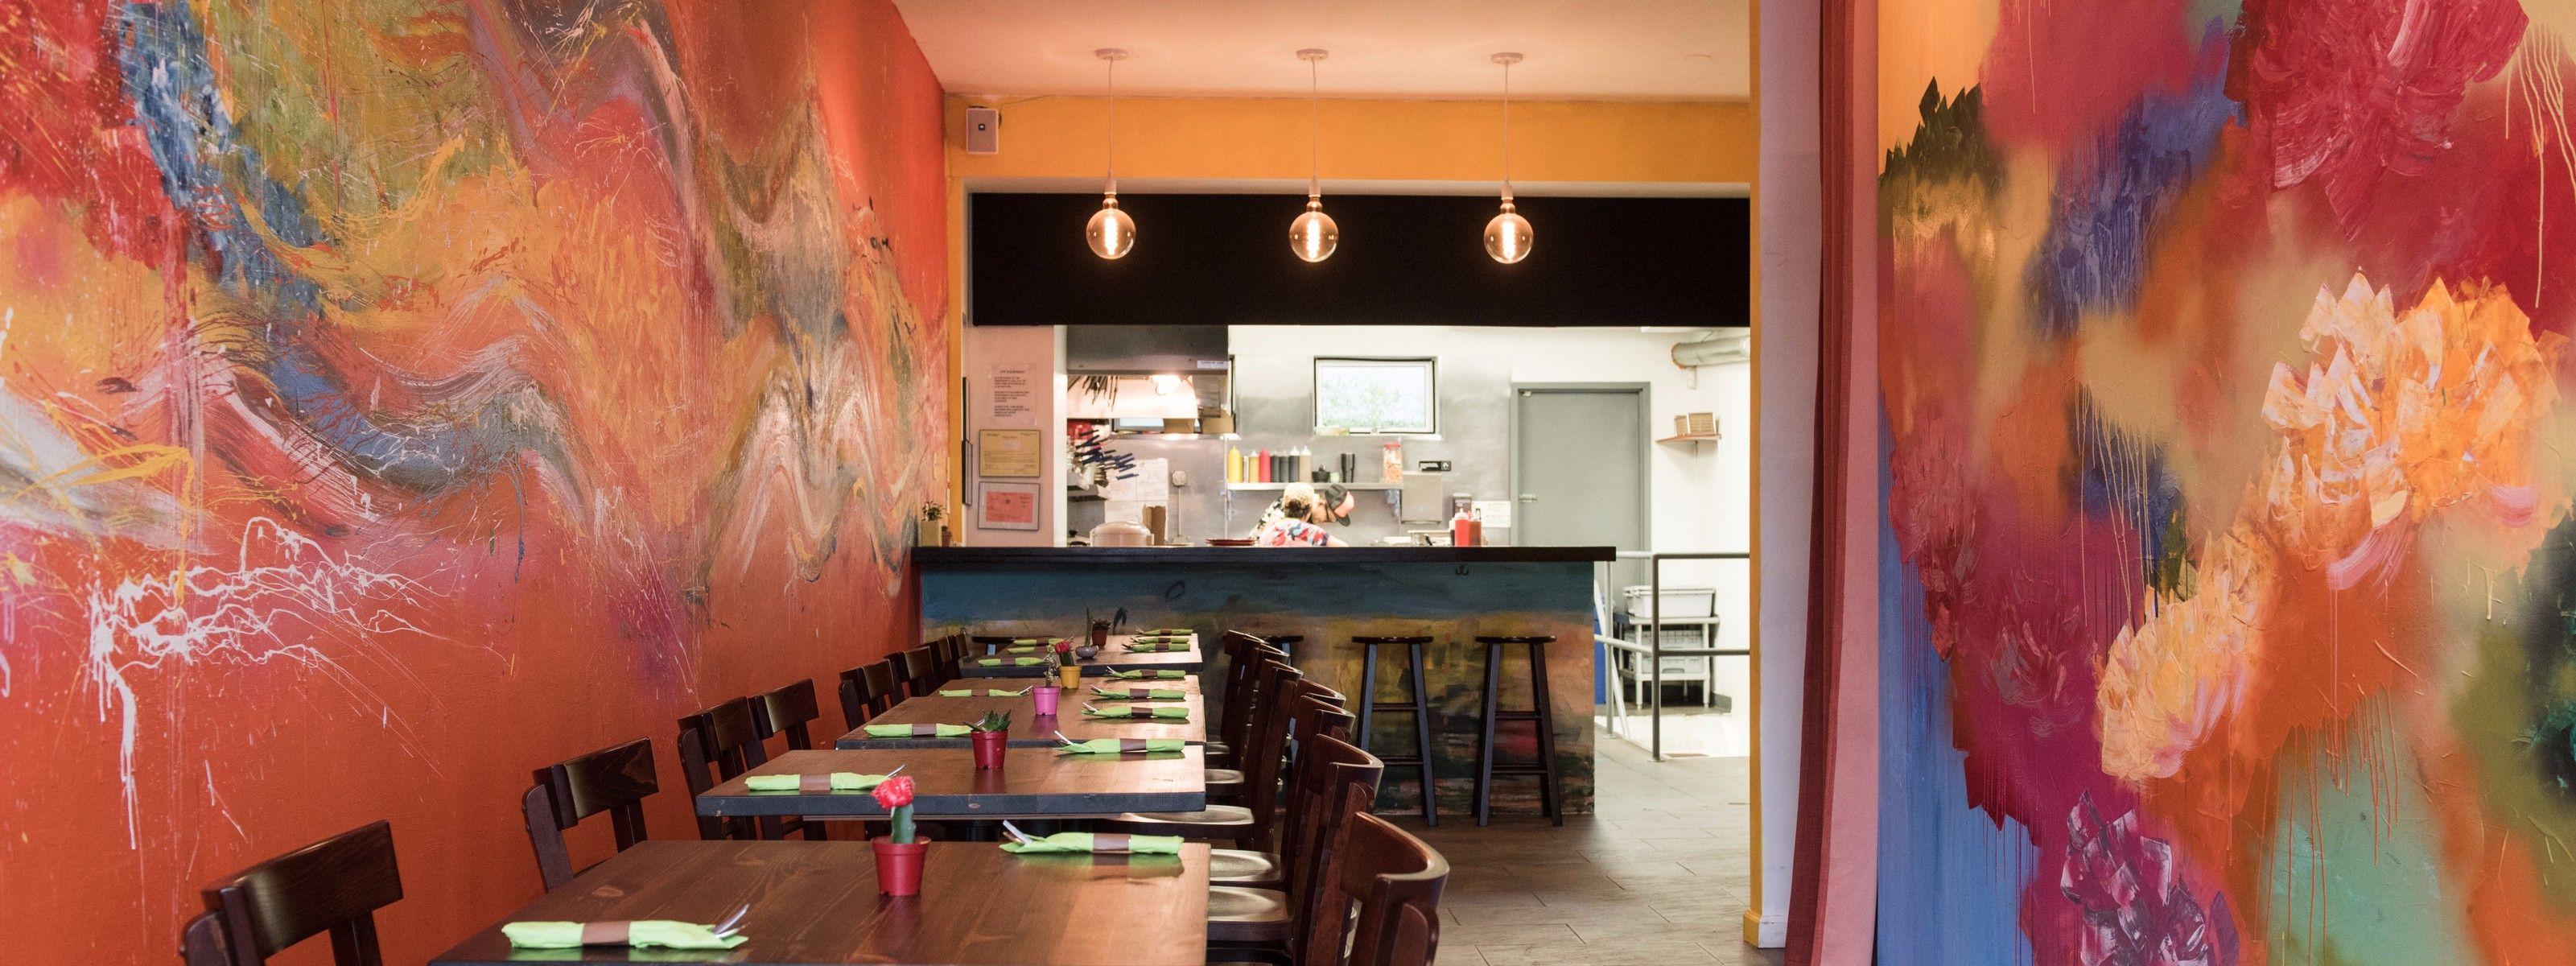 c85718ee6b69ca409918b3905e175fac - Carroll Gardens Classic Diner New York